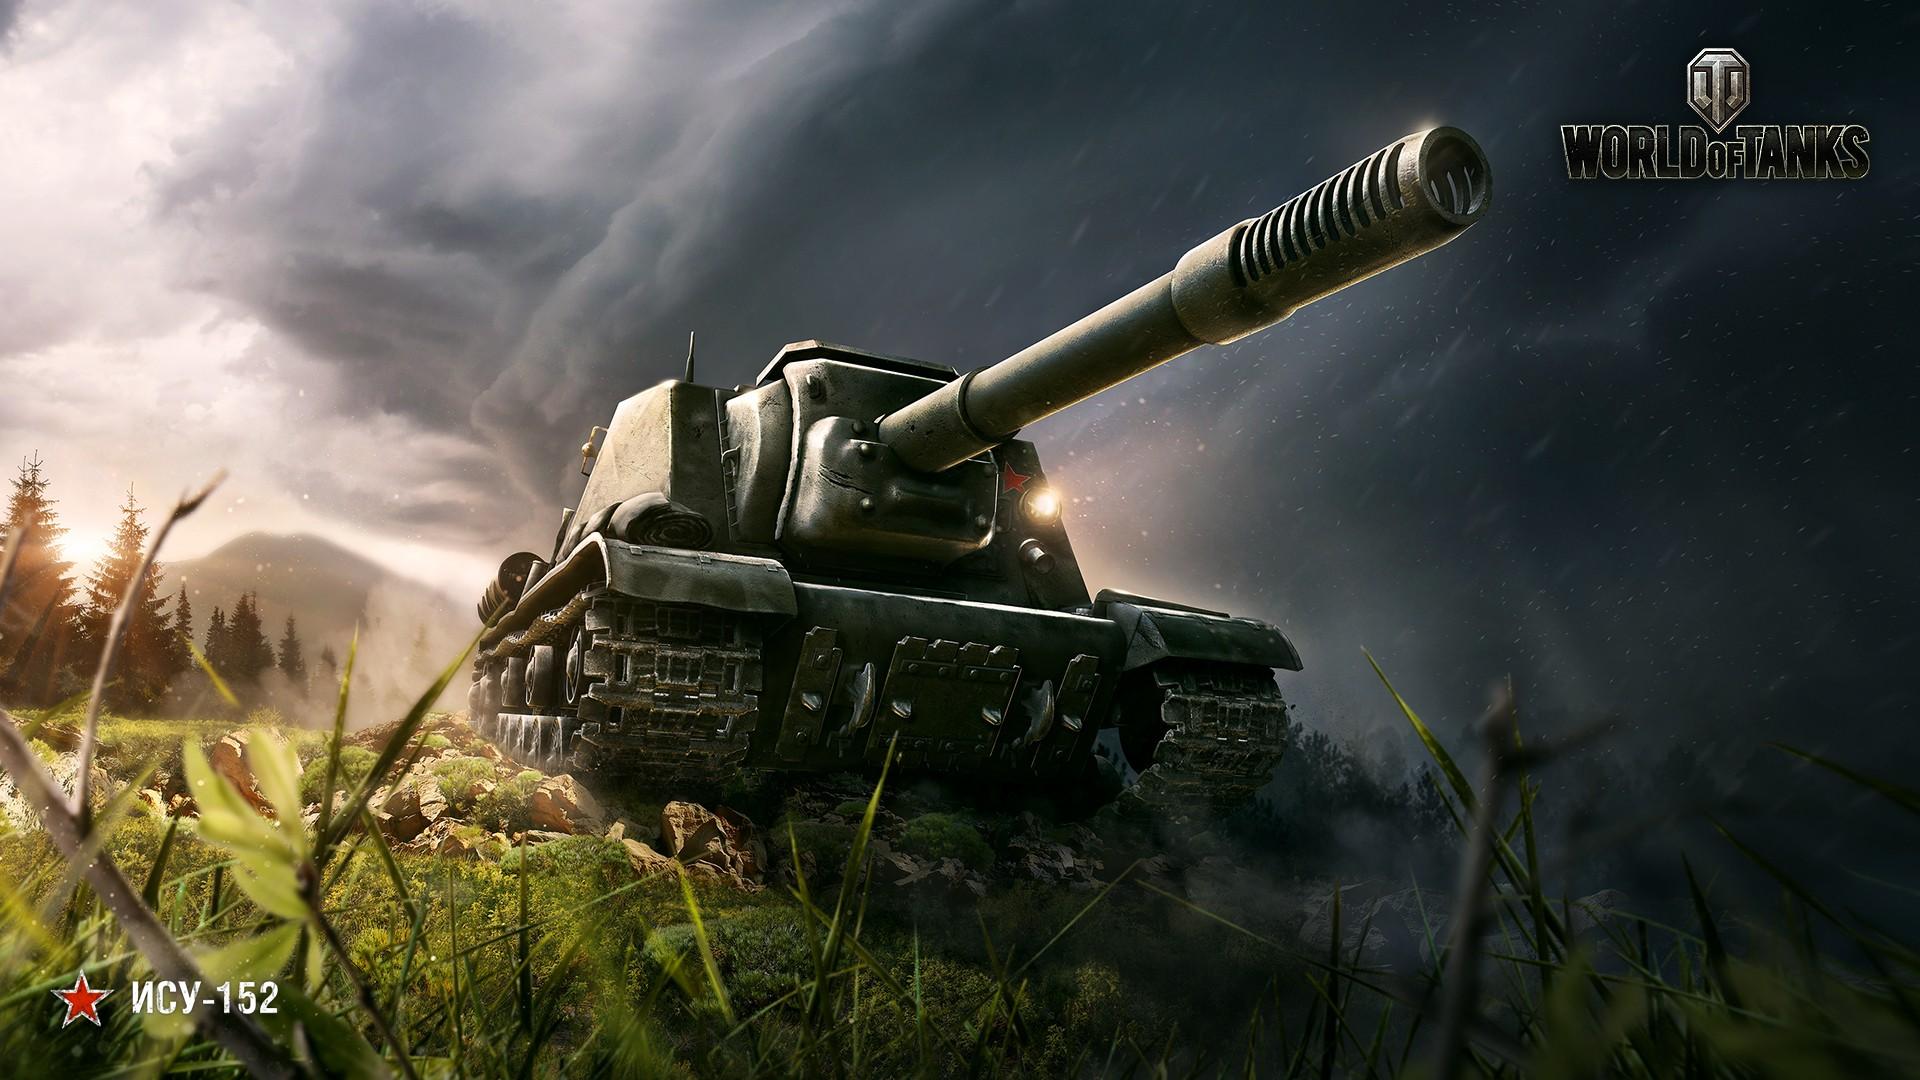 Обои для рабочего стола танки world of tanks 1280x1024